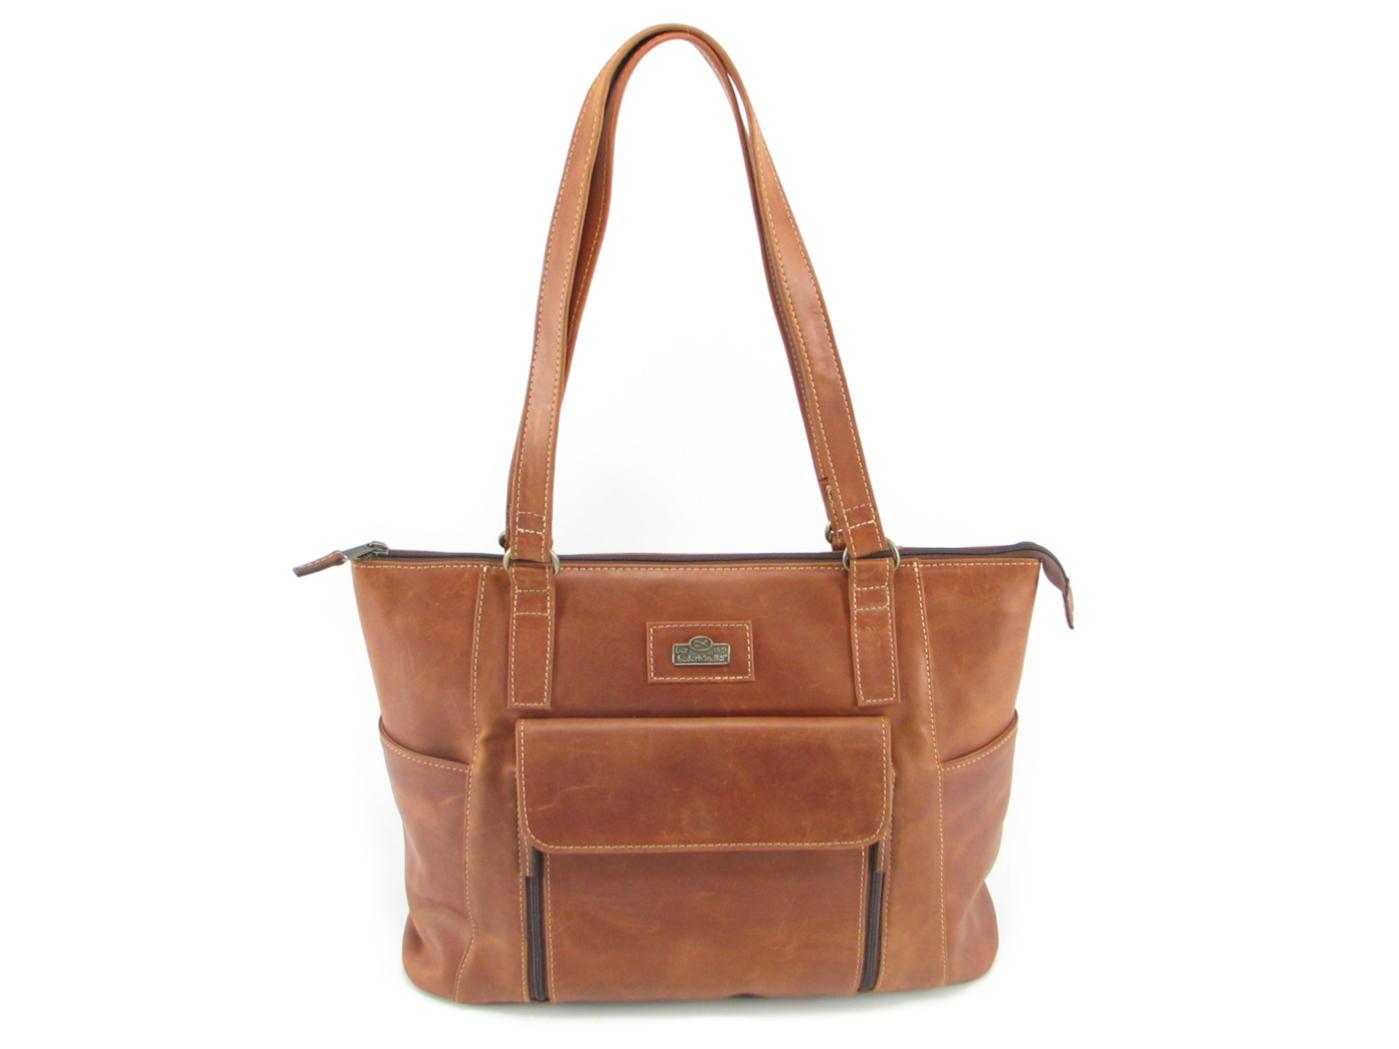 b740a0b6d35ee Classic organizer tote handbag